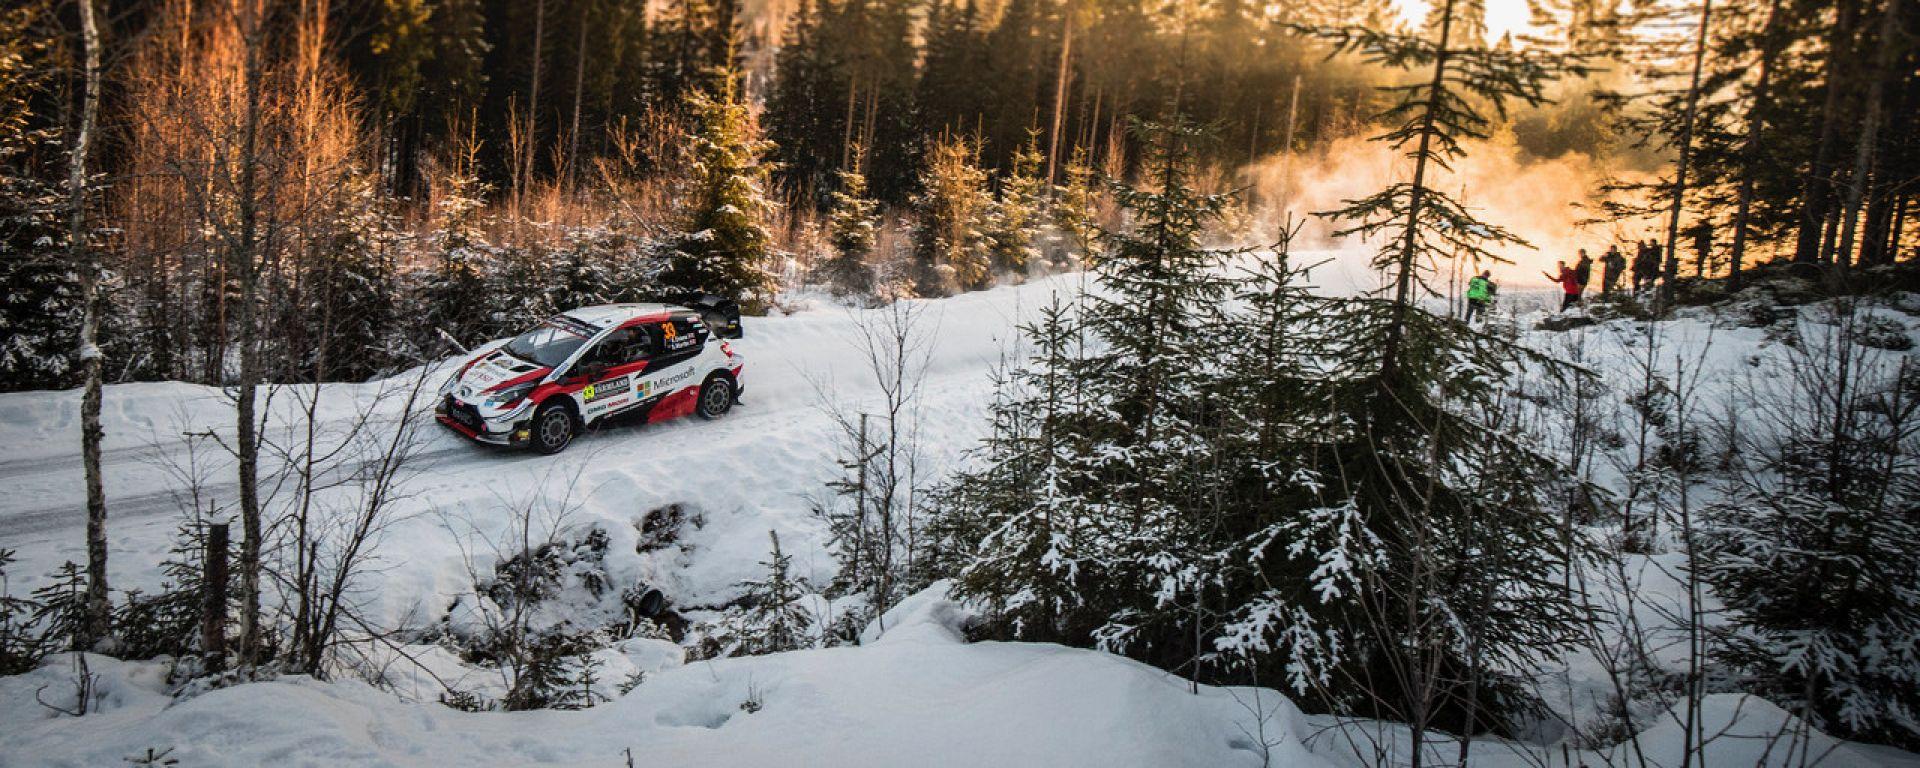 WRC, Rally Svezia 2020: la Toyota di Elfyn Evans